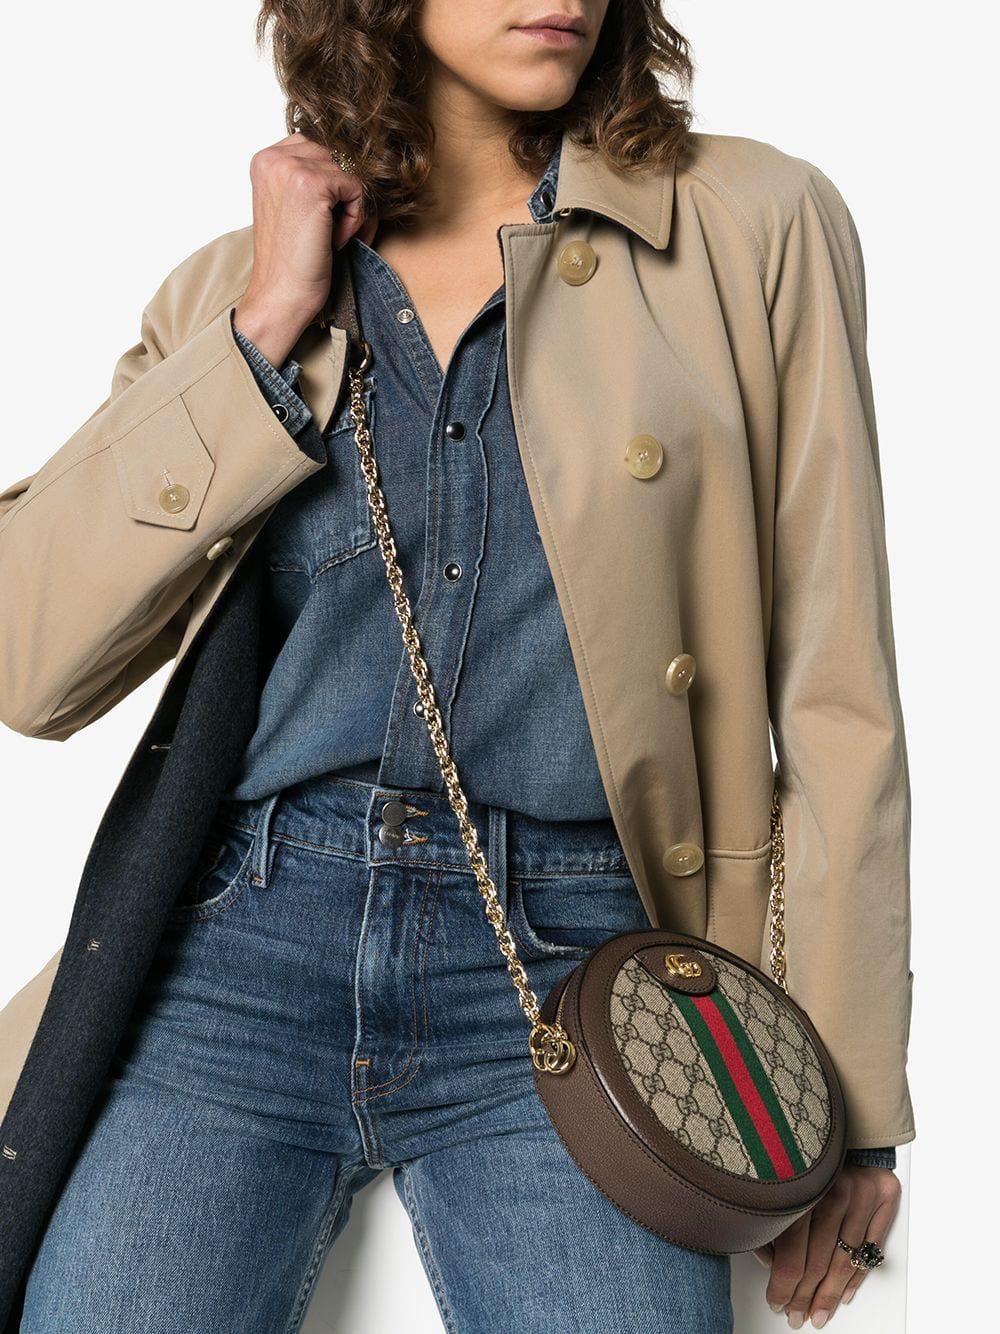 00ae428db Gucci Ophidia Mini Gg Round Shoulder Bag In Neutrals | ModeSens